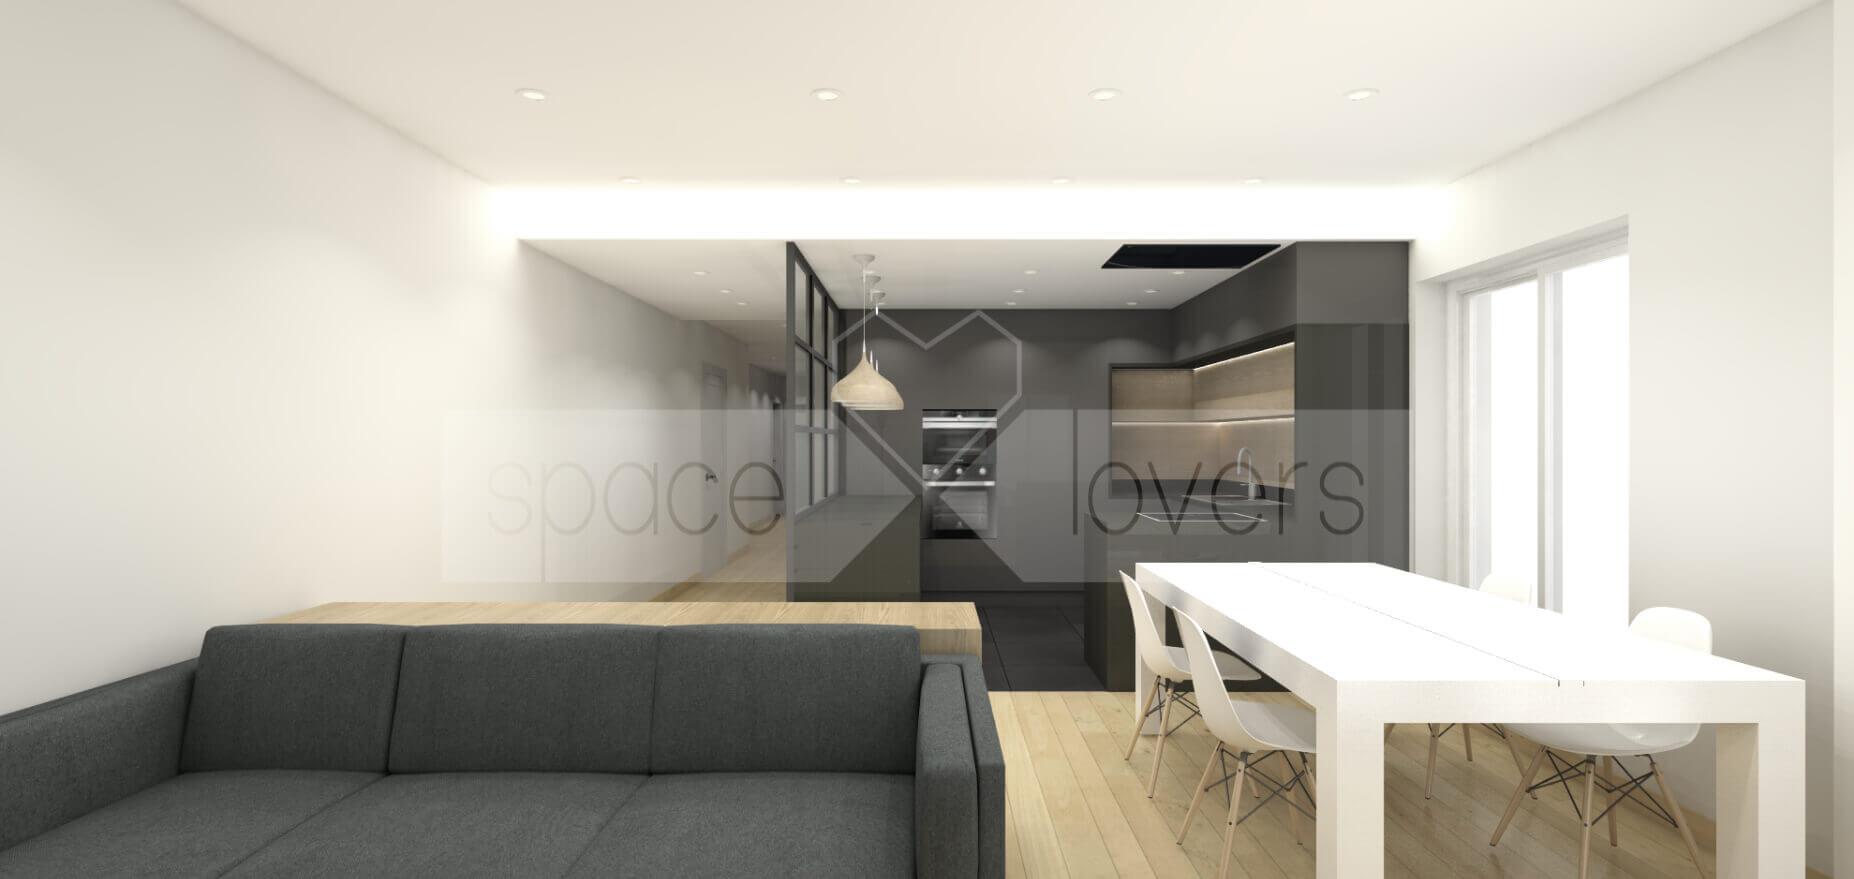 remodelacao-apartamento-parque-das-nacoes-lisboa-cozinha-industrial-open-space